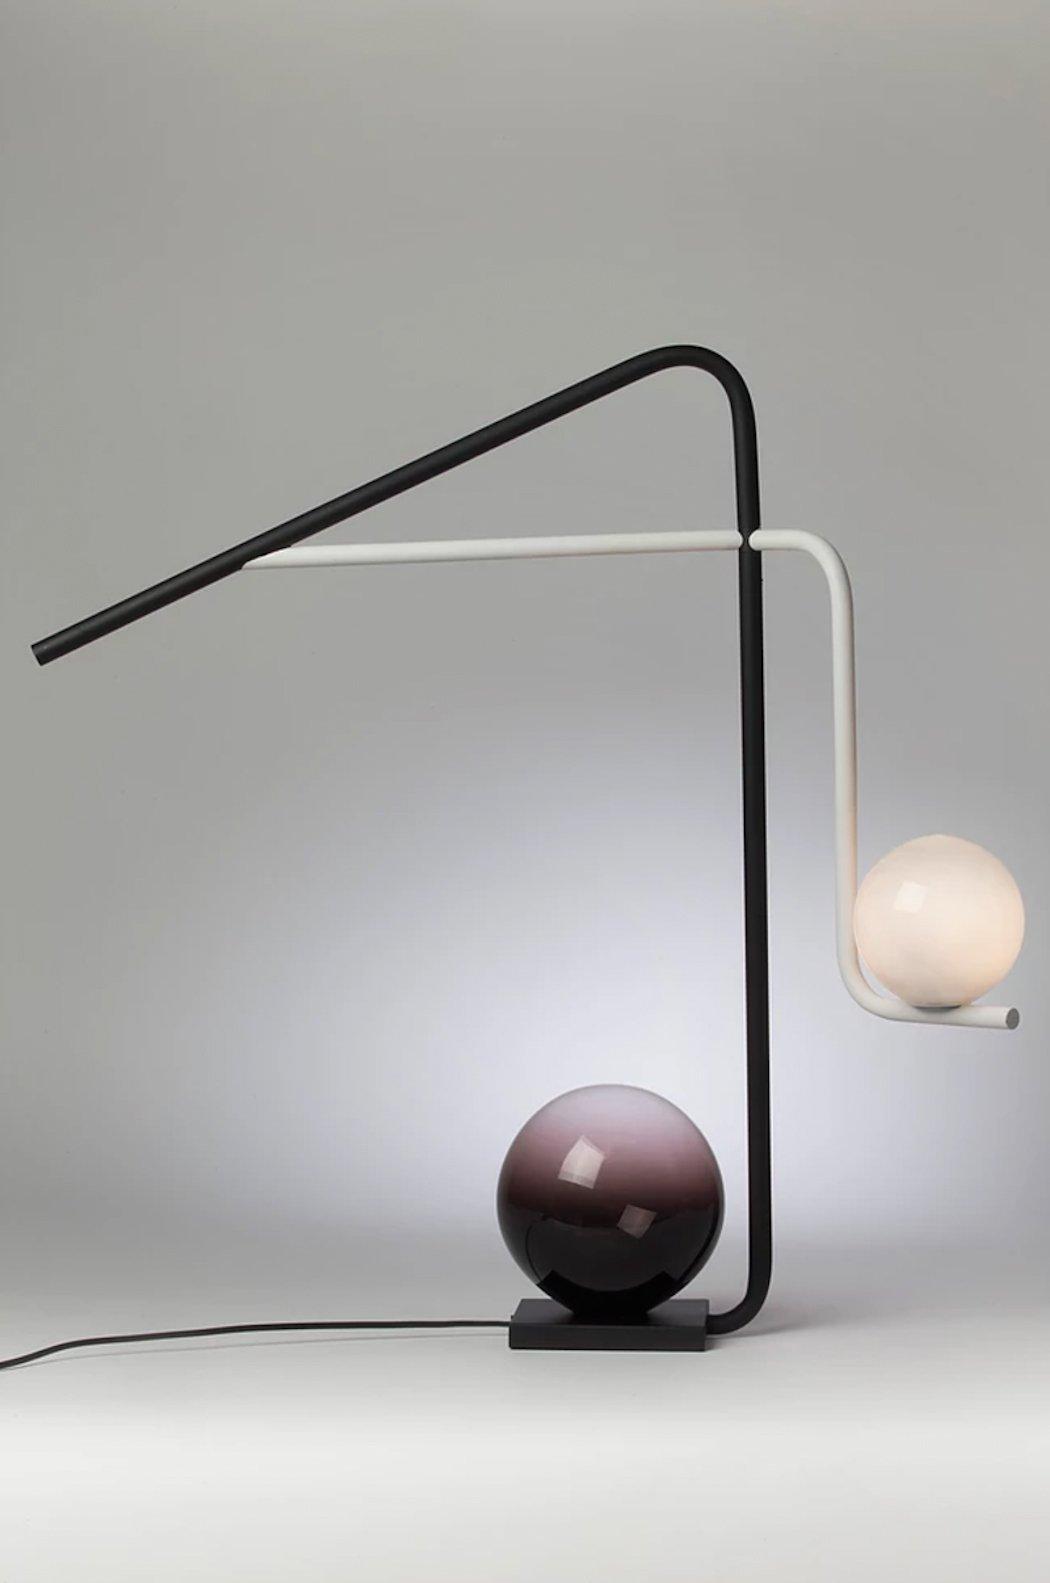 iGNANT_Design_Sculptures_Lumineuses_Nathalie_Nahon-2